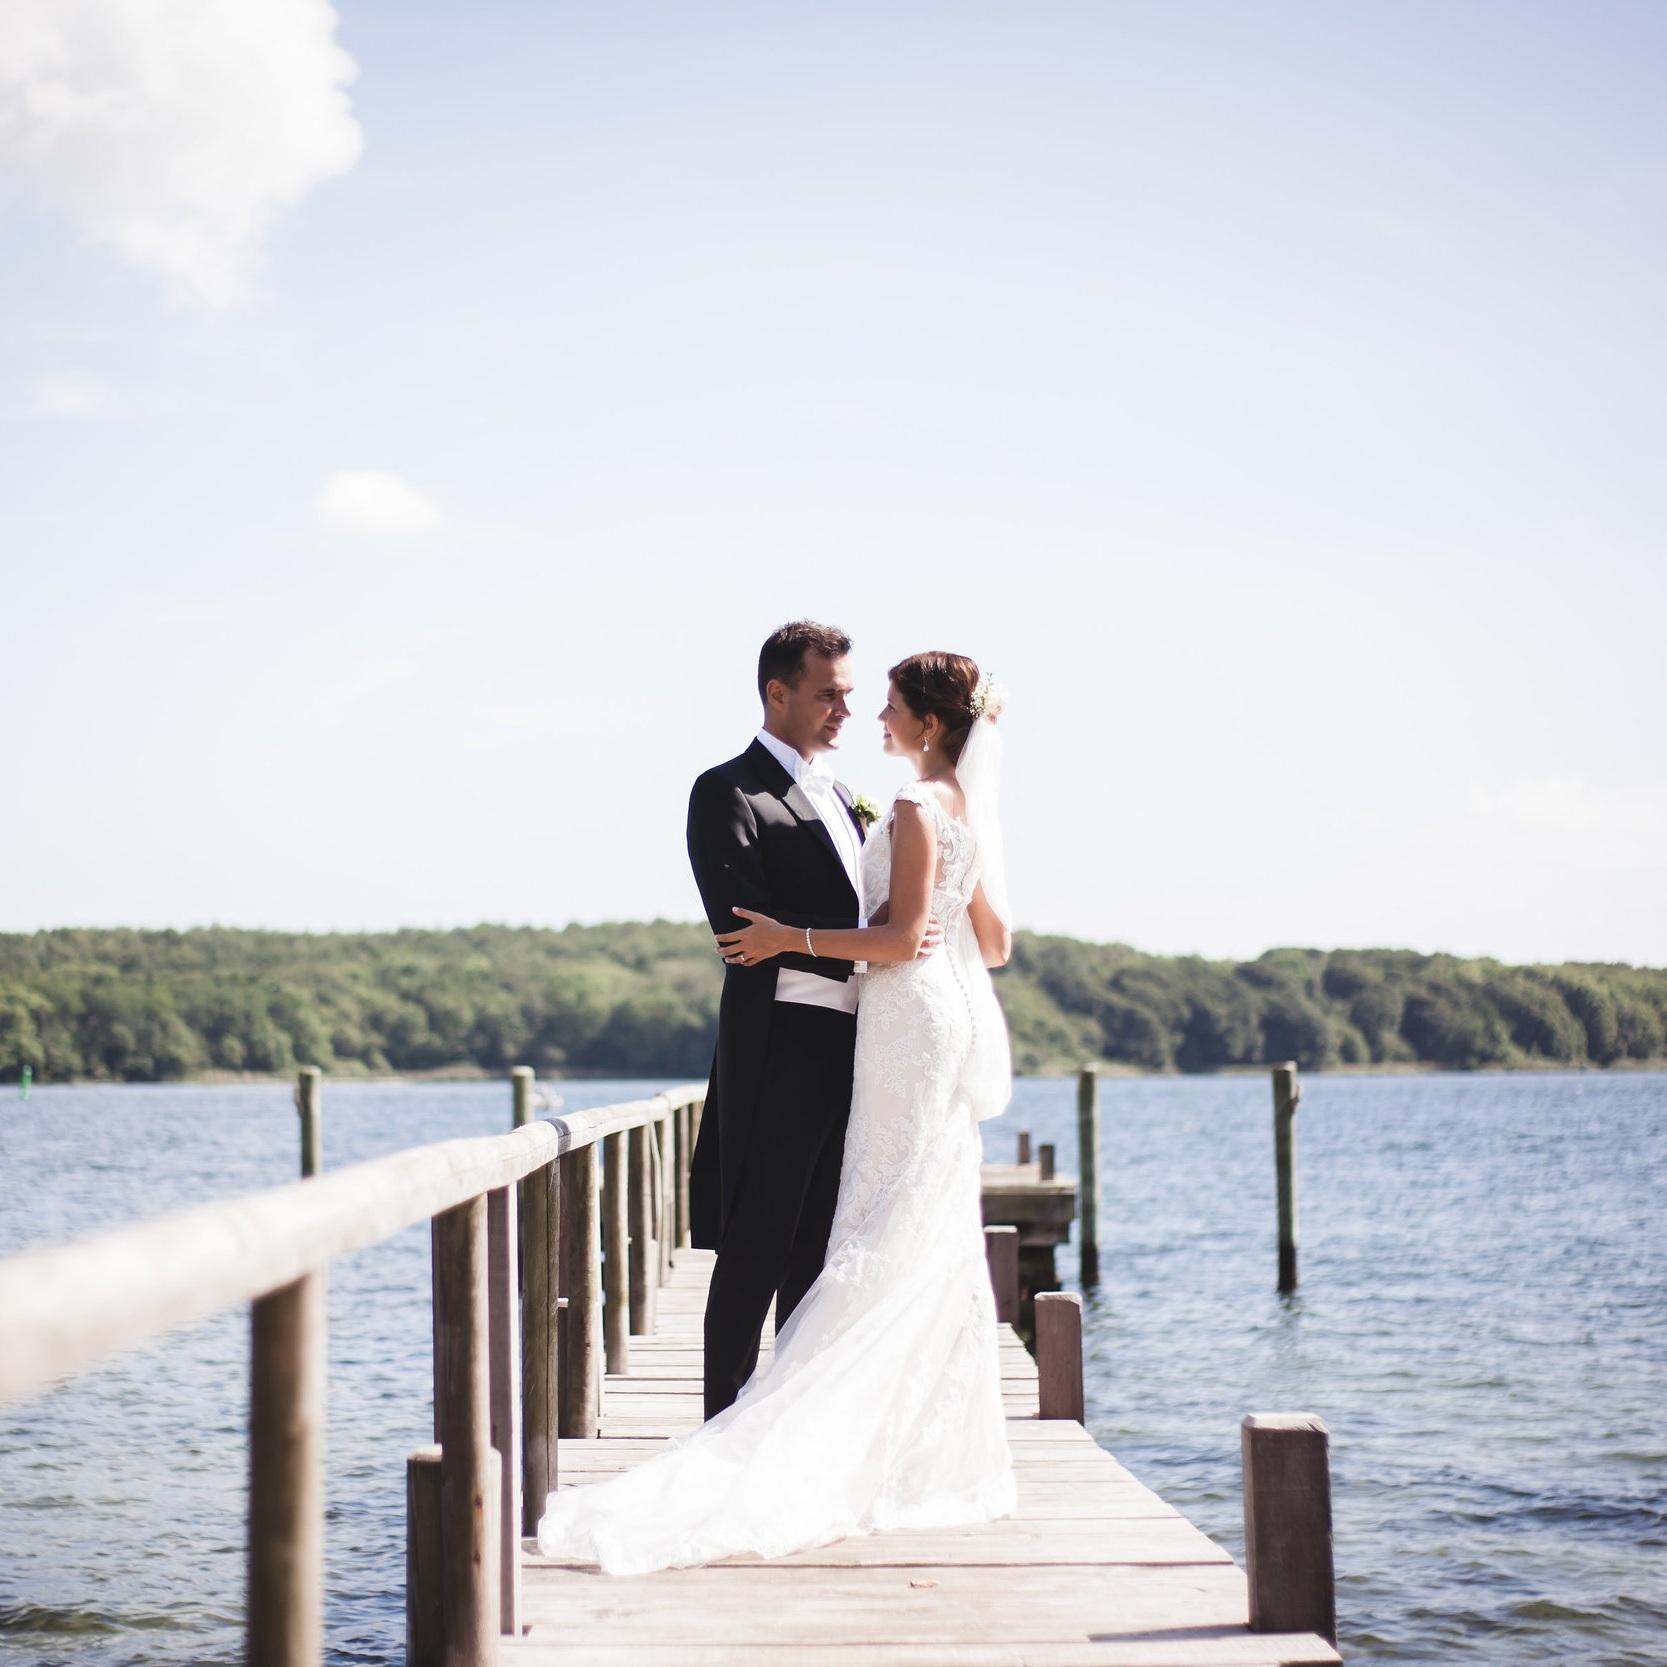 Hold romantisk bryllupsfest på Stella MarisJPG